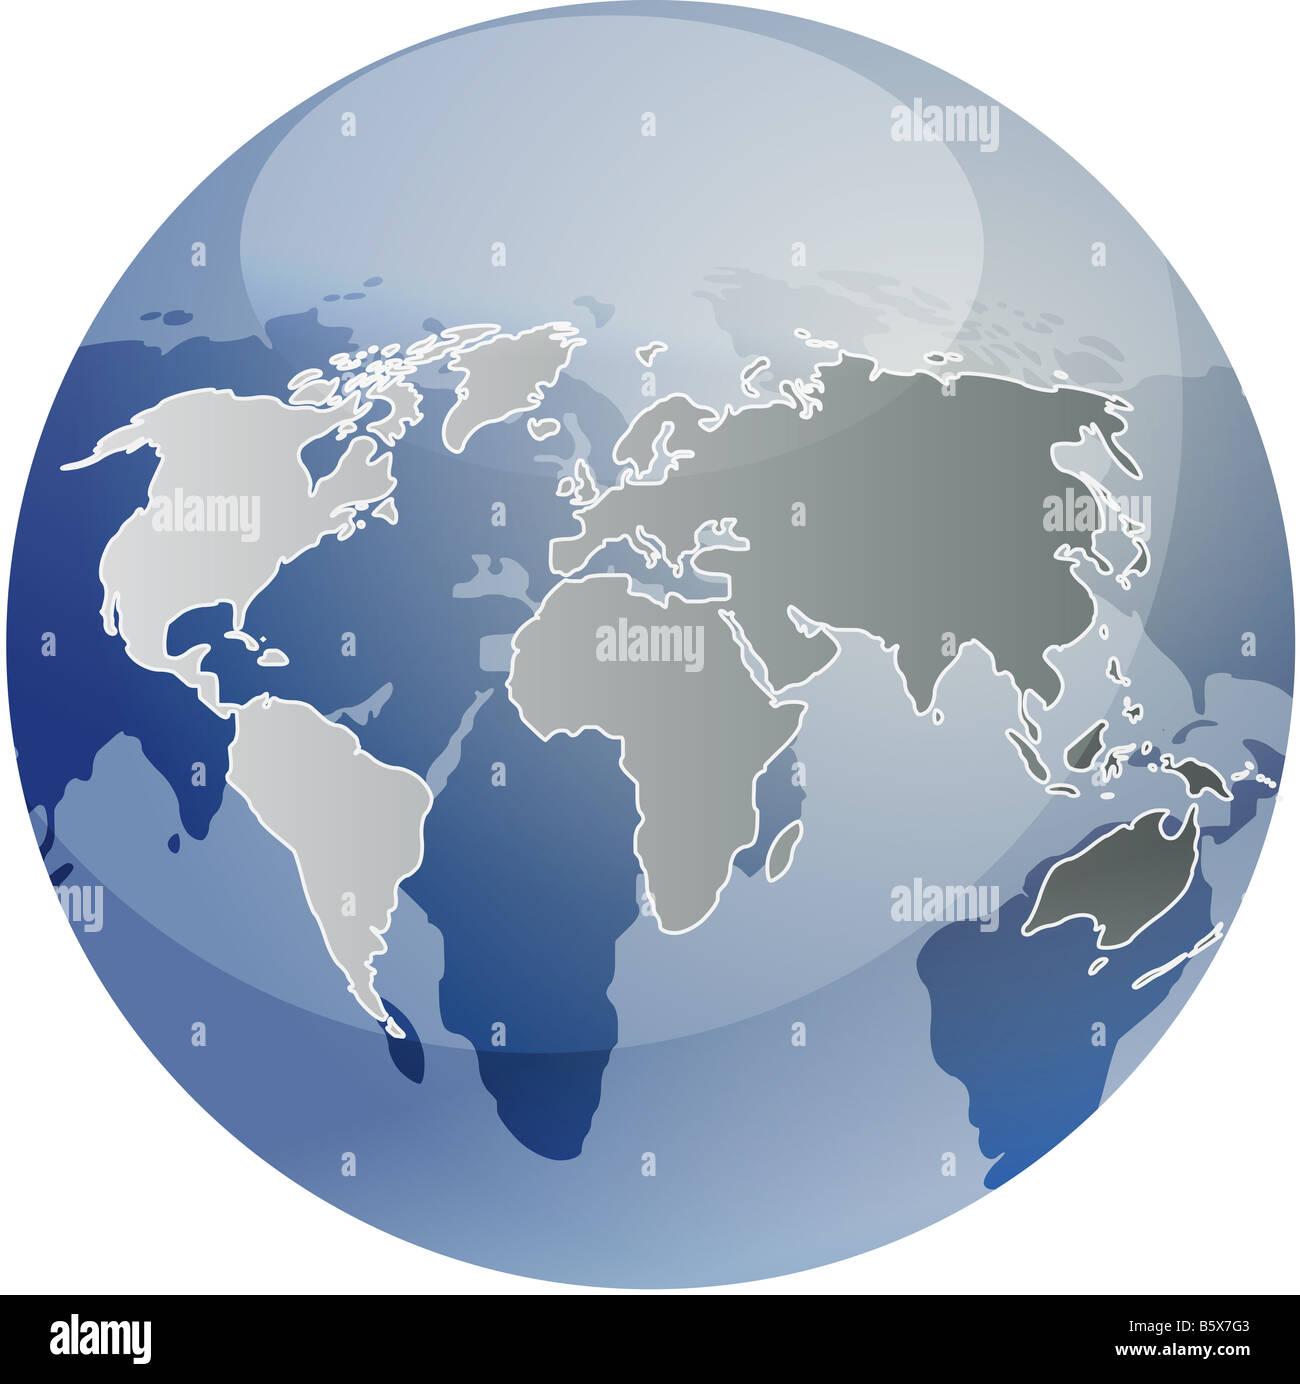 Spherical World Map.Map Of The World Illustration On Glossy Spherical Globe Stock Photo